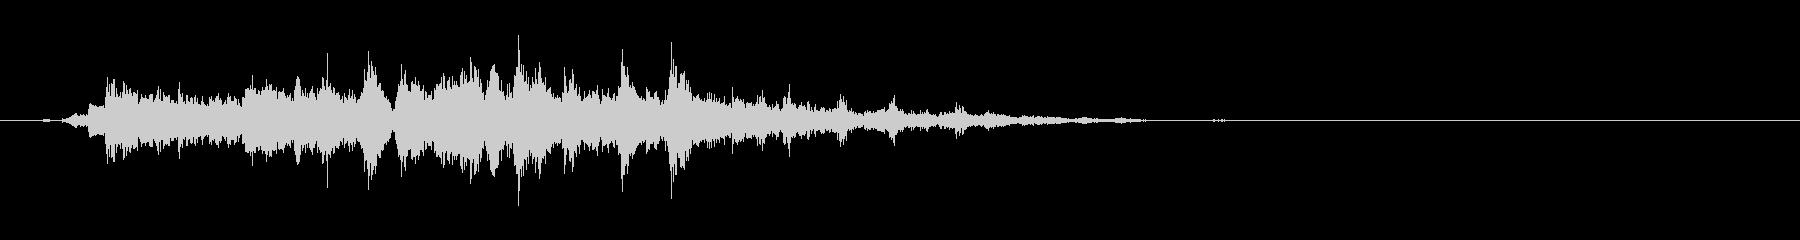 "Single sound 2 of heavy bell sound ""Ekiro""'s unreproduced waveform"